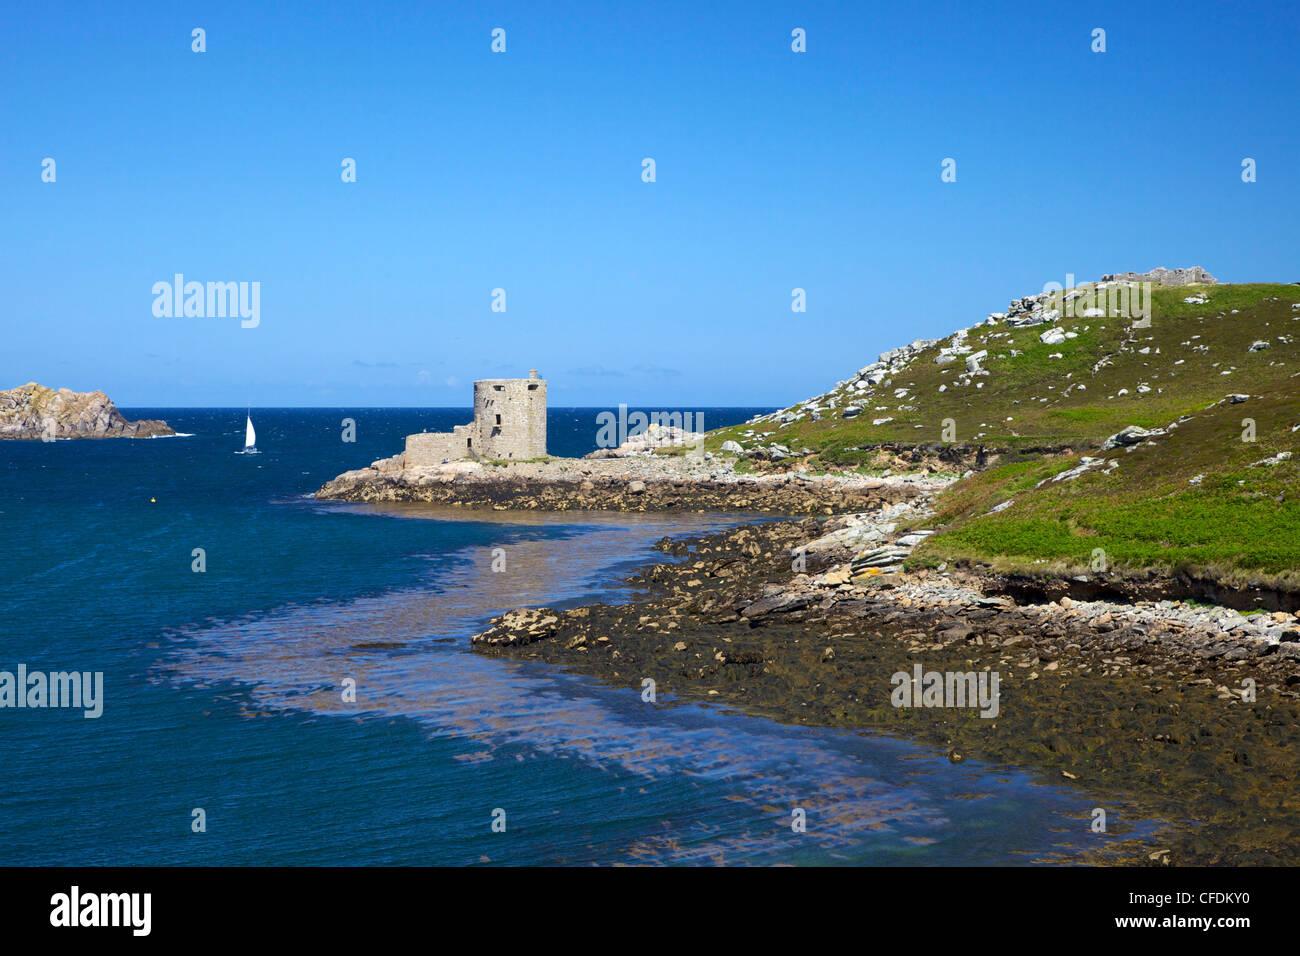 Cromwell's Castle, Island of Tresco, Isles of Scilly, England, United Kingdom, Europe - Stock Image